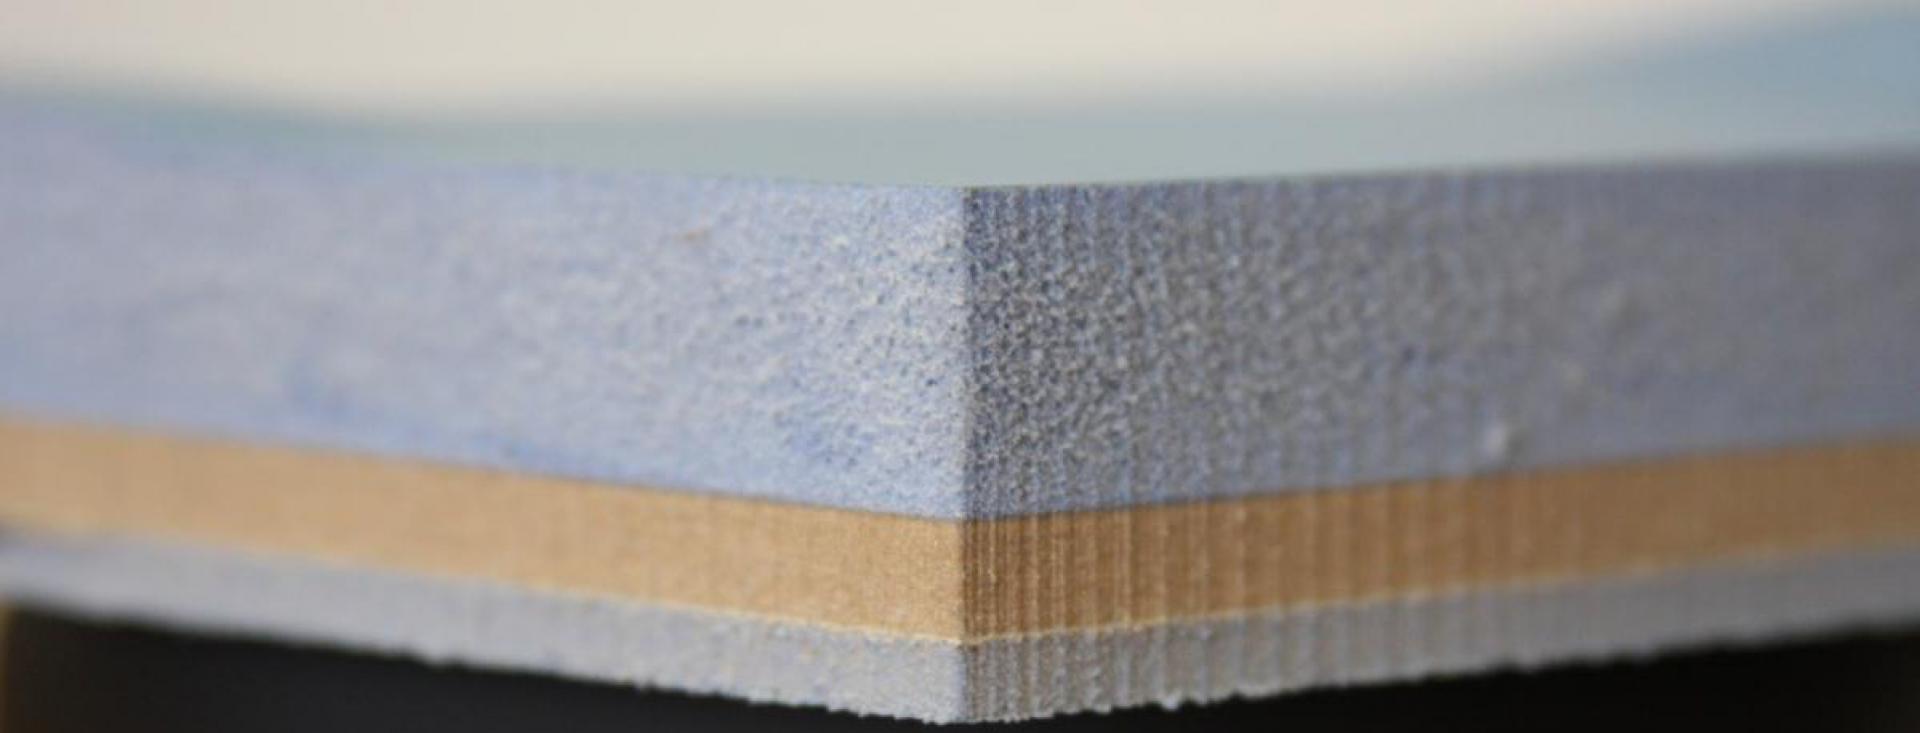 Foam Materials